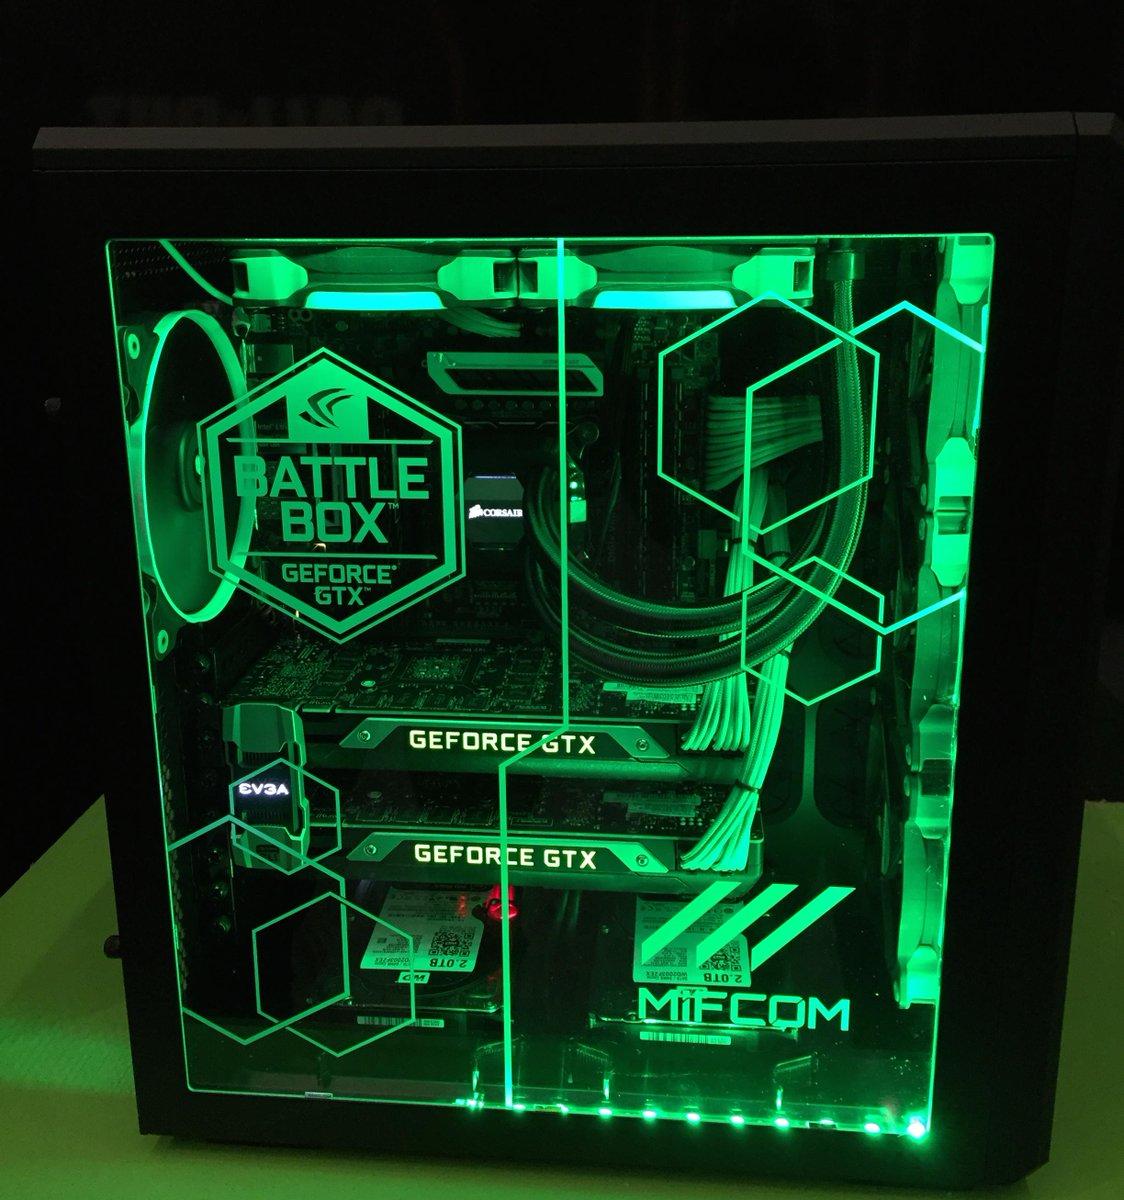 Battle box Black Ops 3